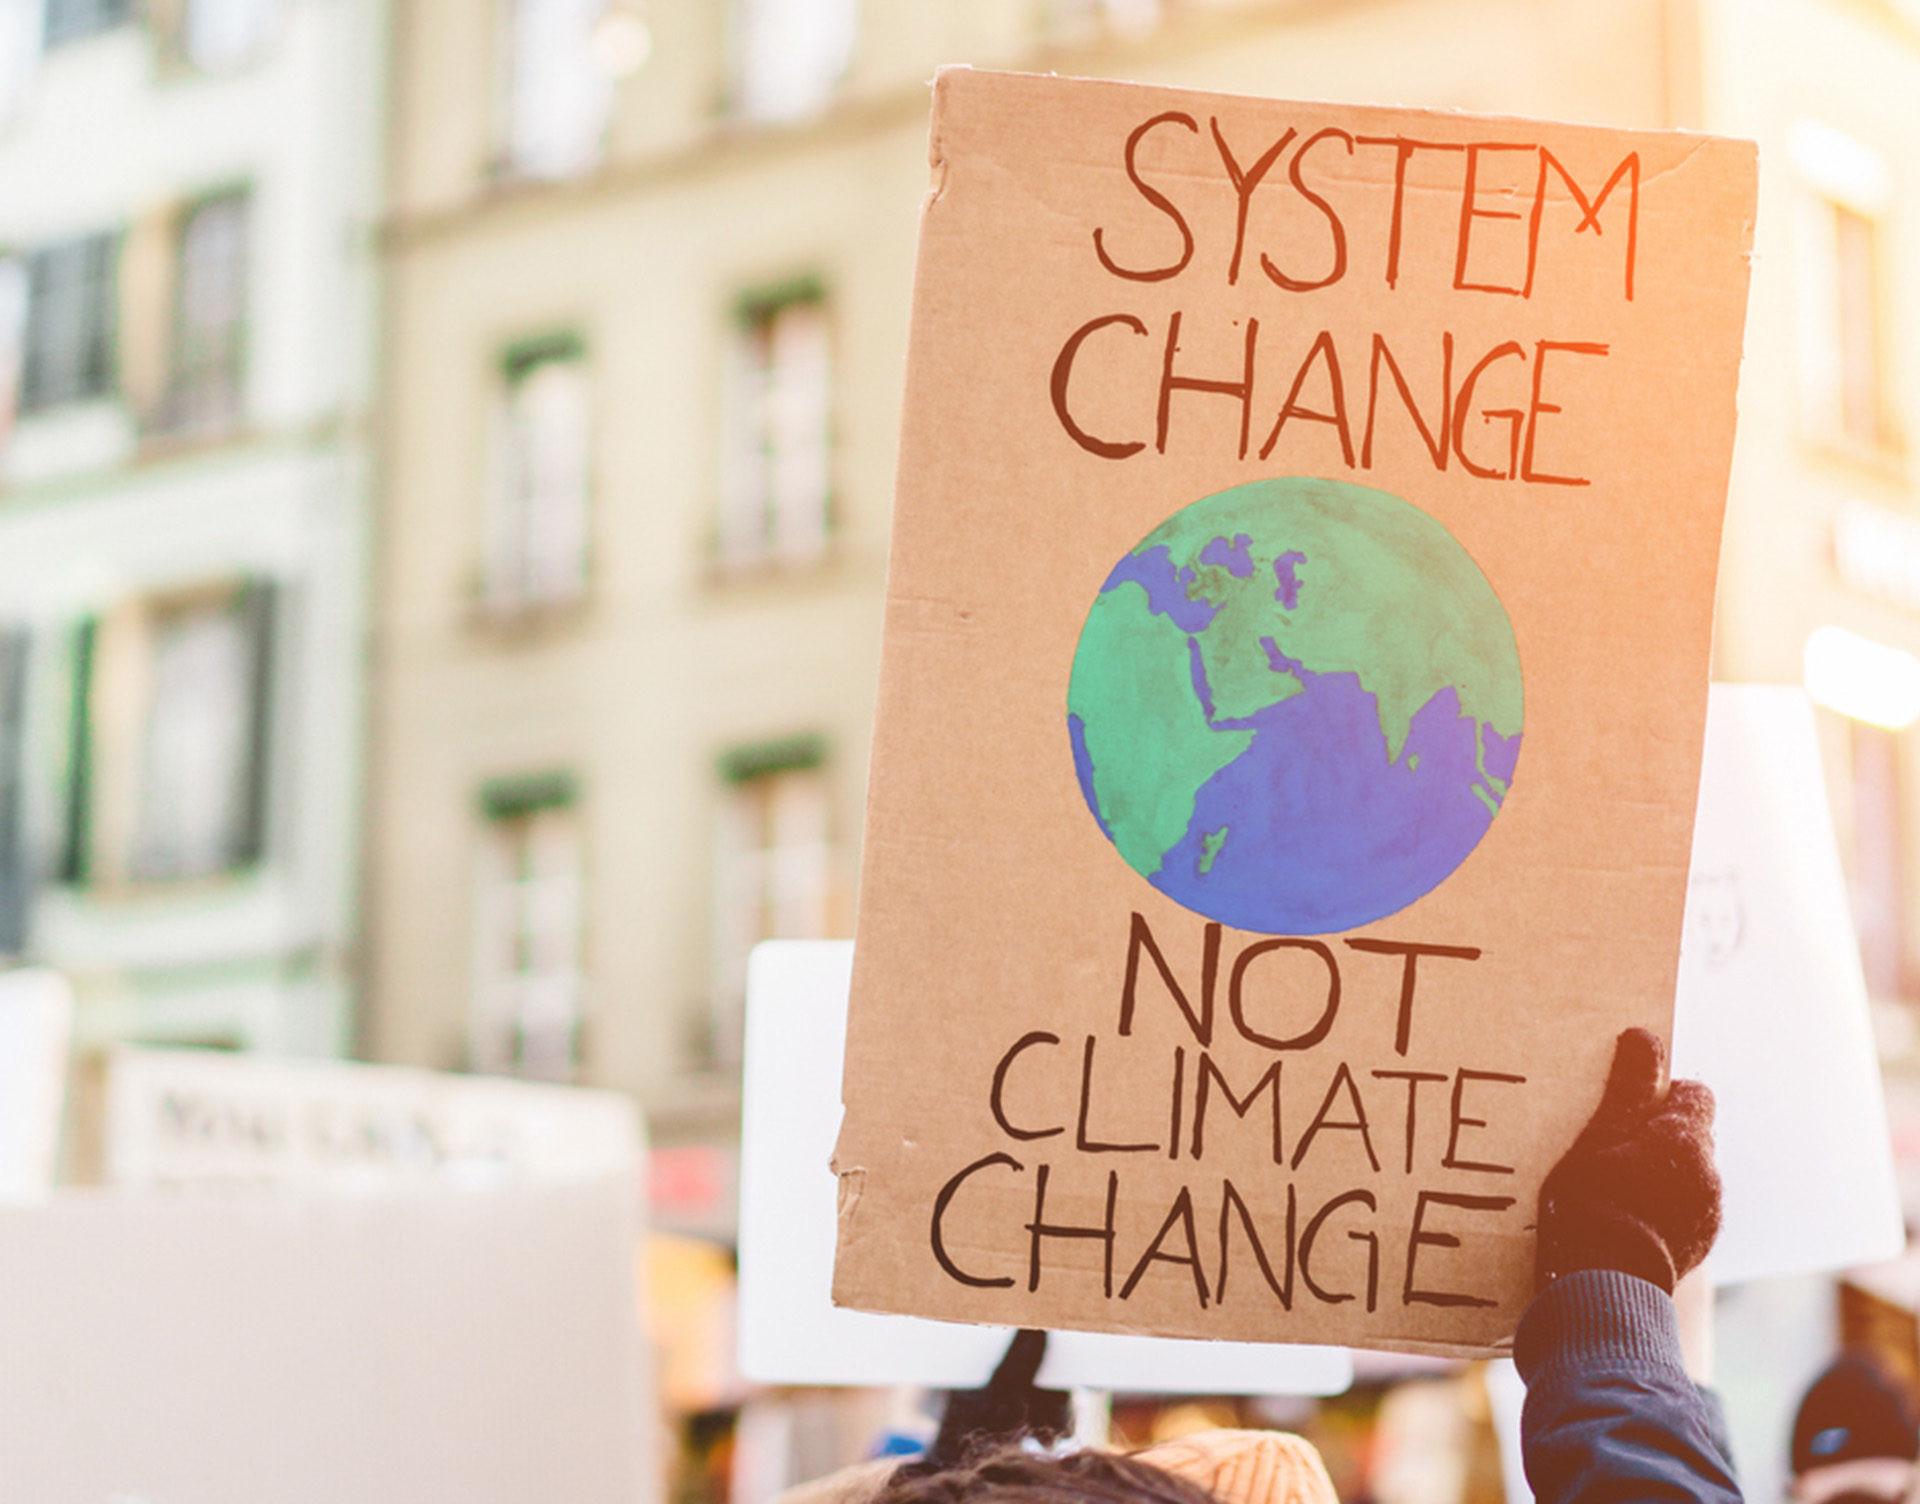 climathon cambio climatico emergencia lucha